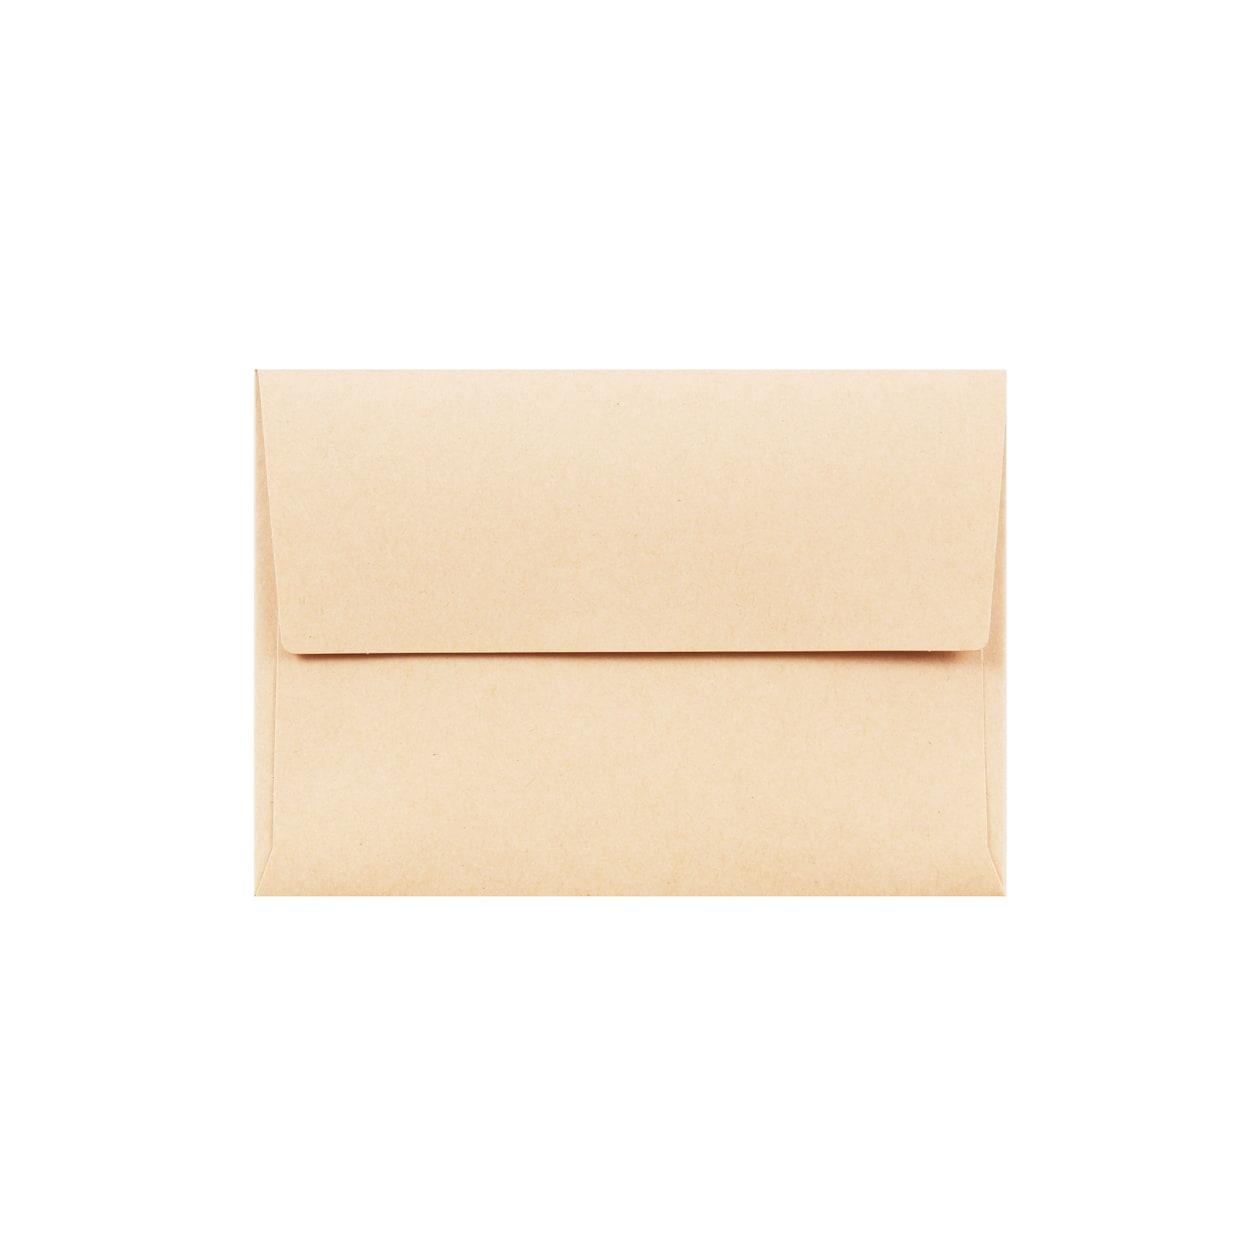 C7カマス封筒 HAGURUMA Basic ウッドブラウン 100g